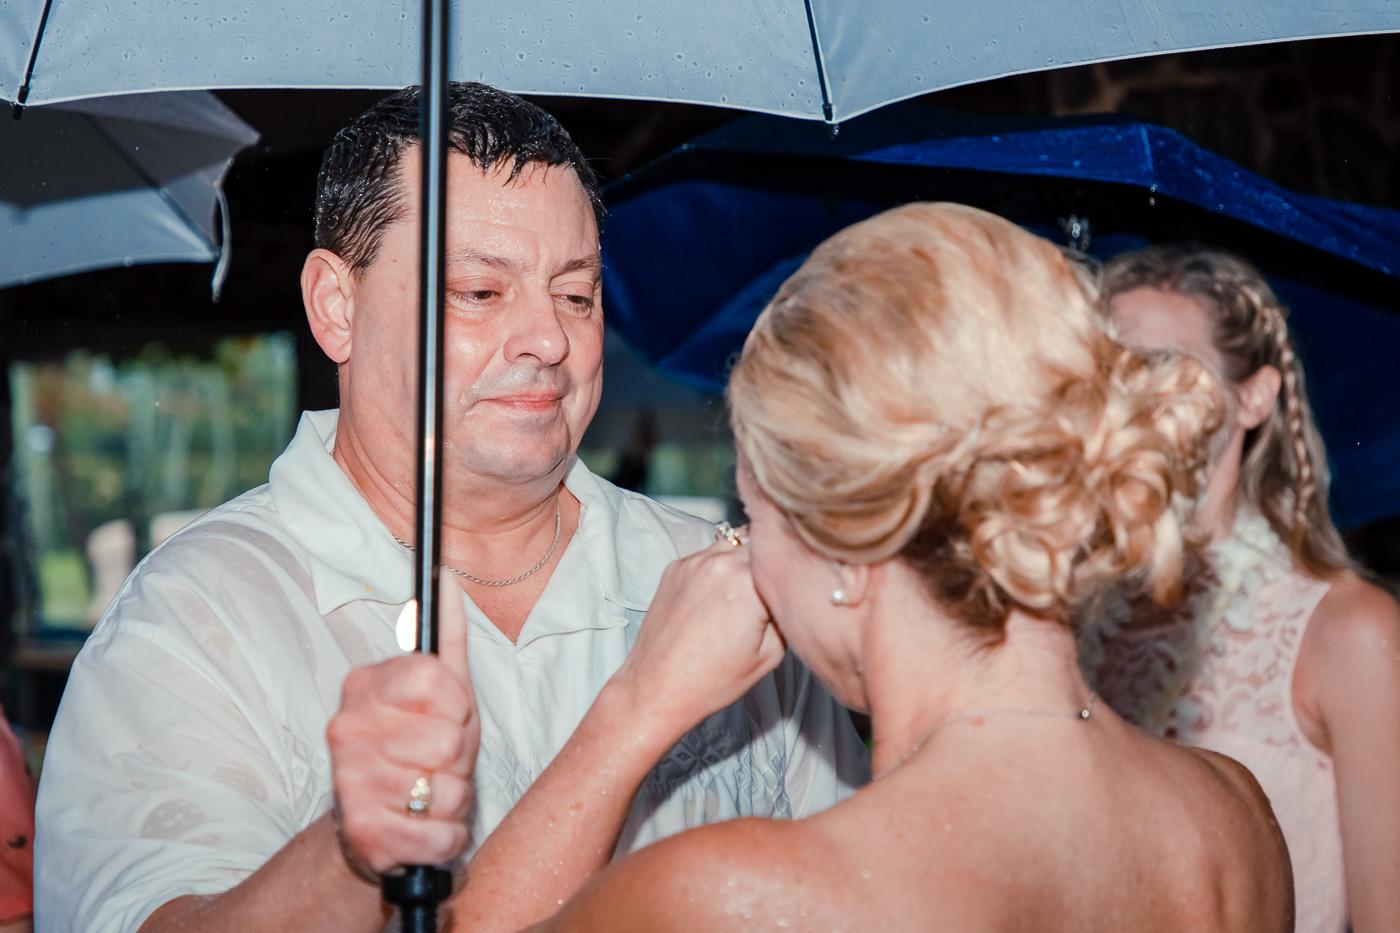 wedding-redux-40977.jpg